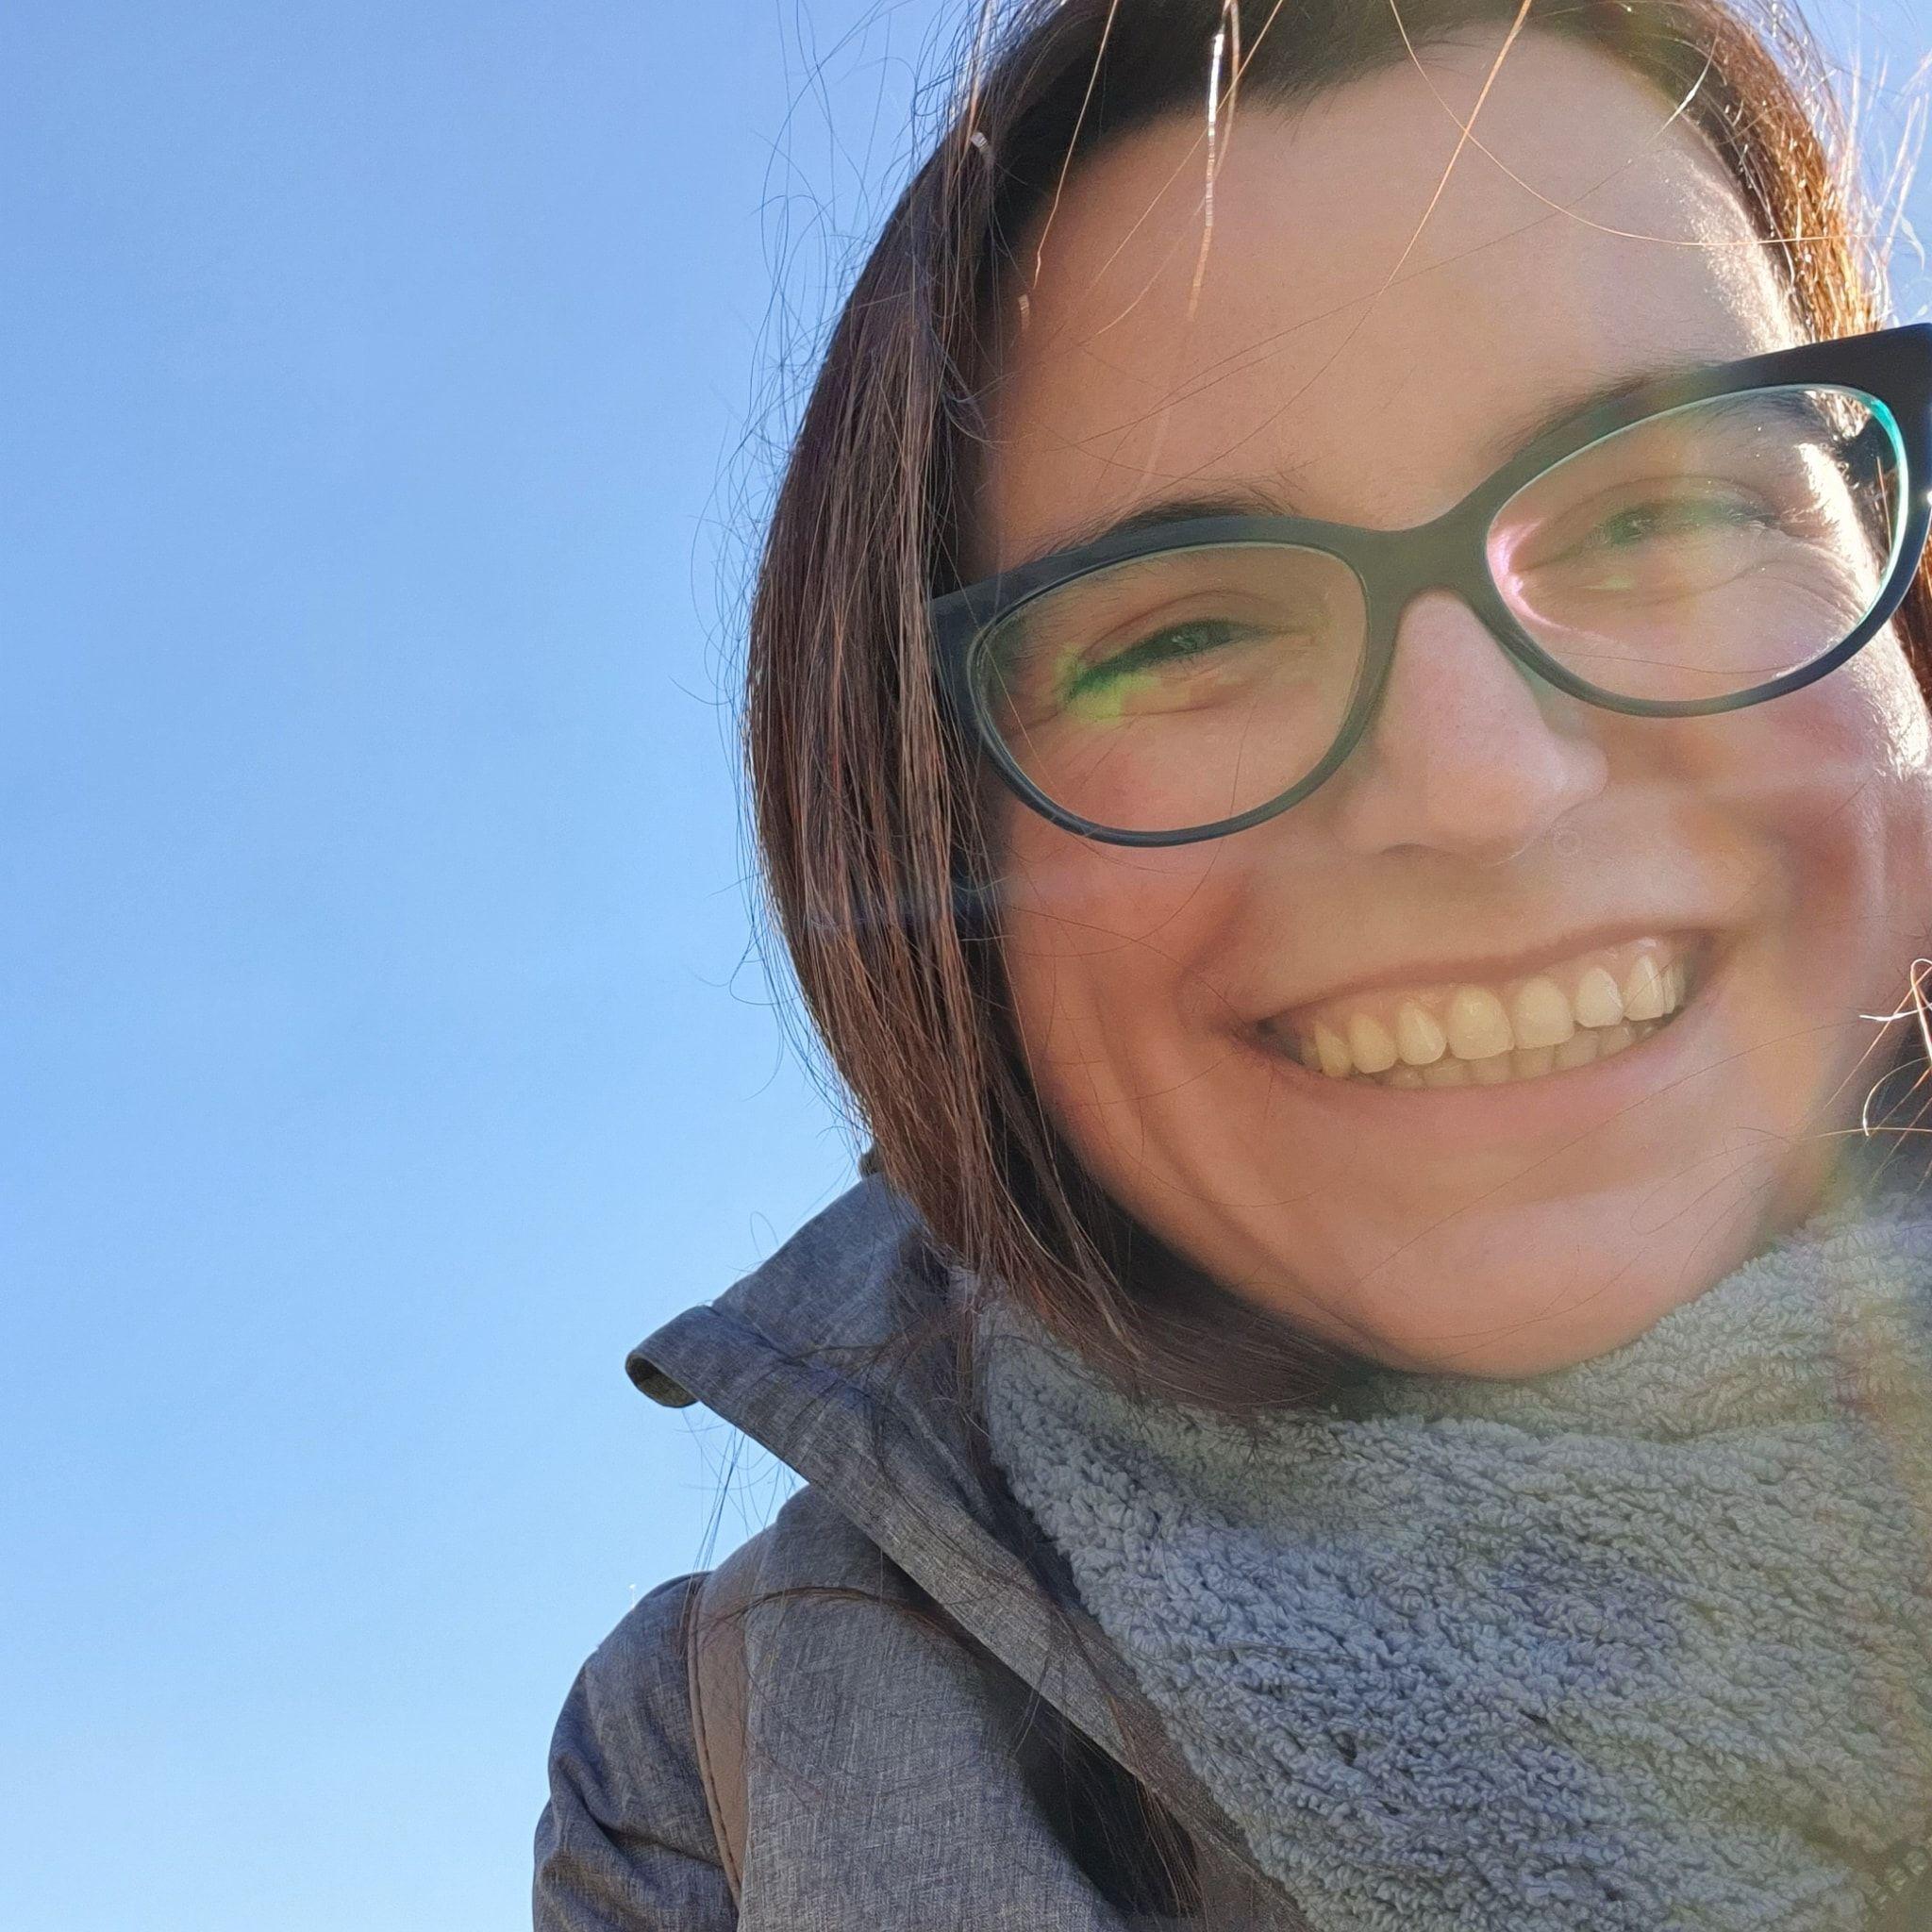 Katarina Andrejević Hacker Noon profile picture